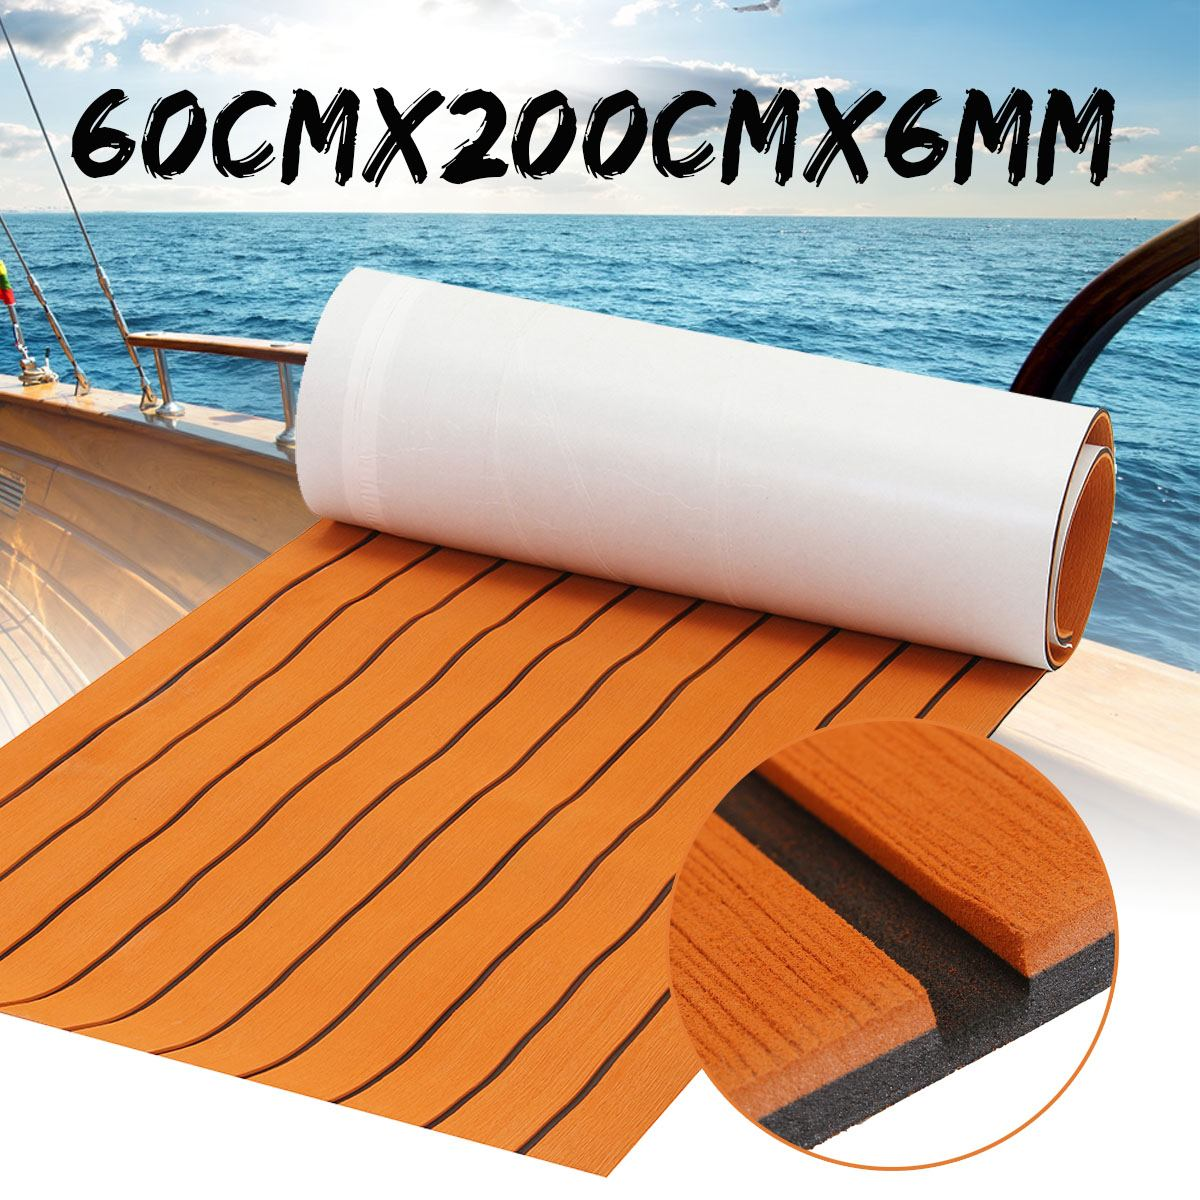 600*2000*6mm Self Adhesive Boat Marine EVA Foam Teak Sheet Teak Boat Decking Synthetic Pad Floor Mat Yacht Cruise Car Boat